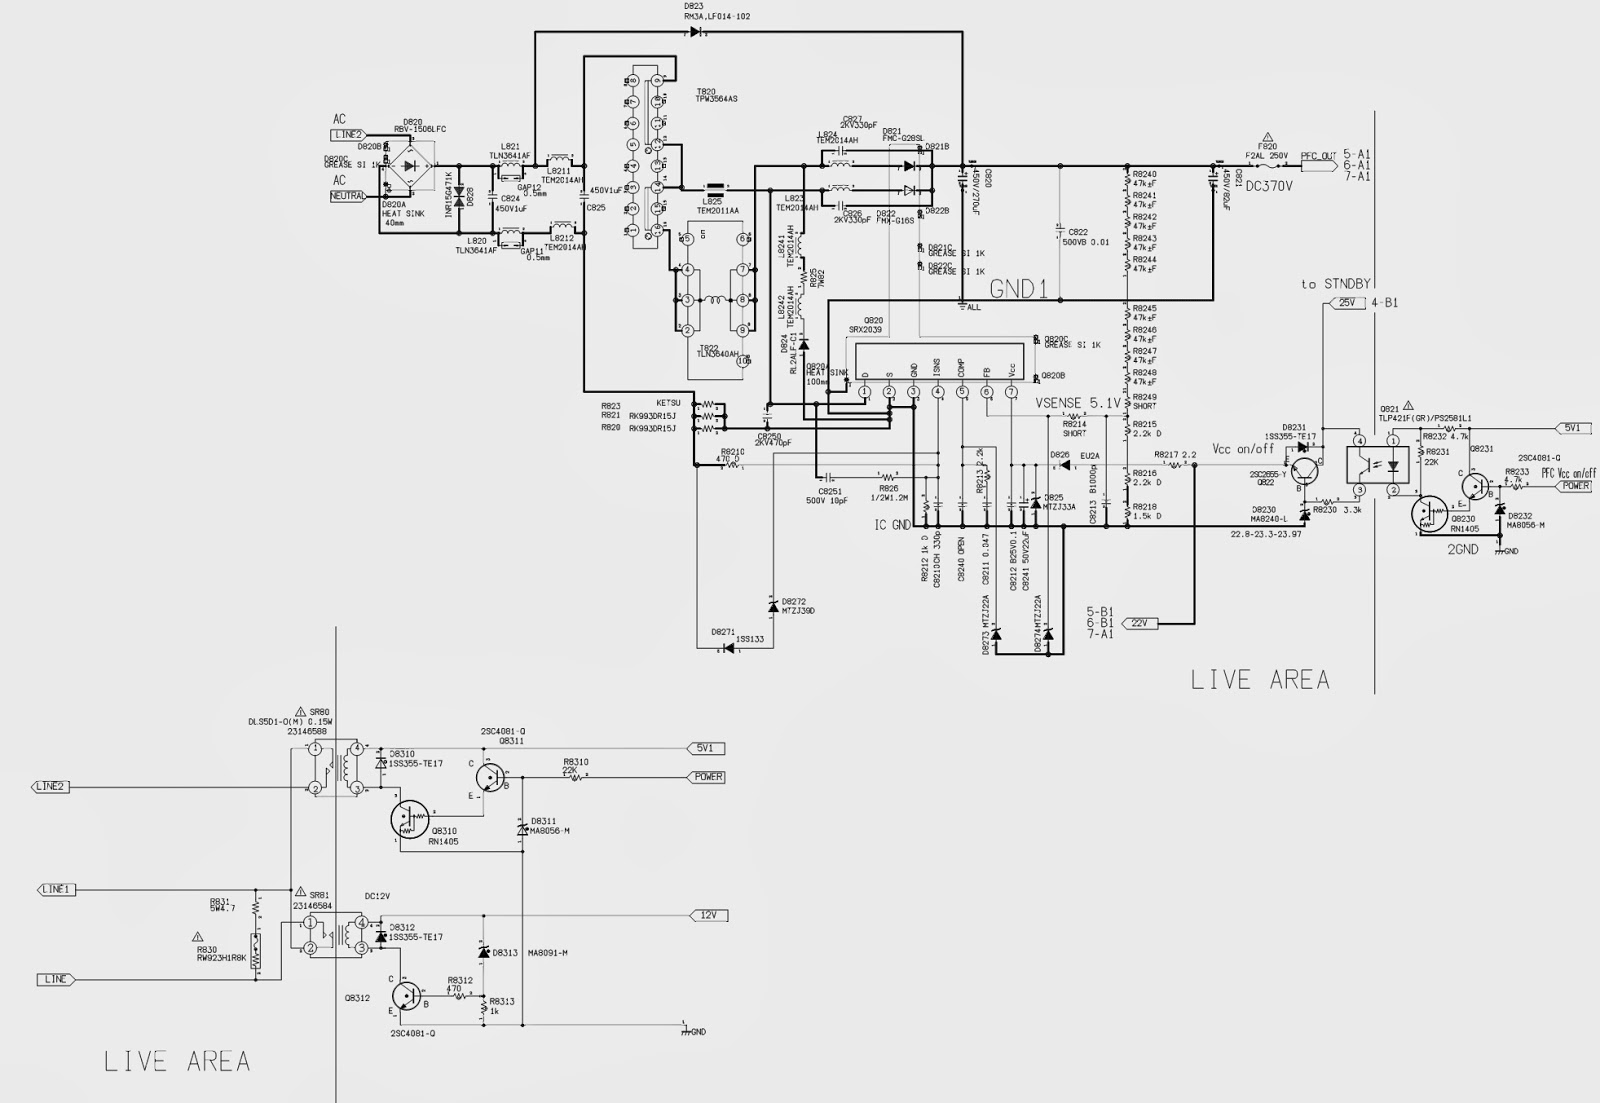 toshiba 32 37 42wl58 series lcd tvs power supply schematics lcd tvs power supply schematics circuit diagram str [ 1600 x 1103 Pixel ]